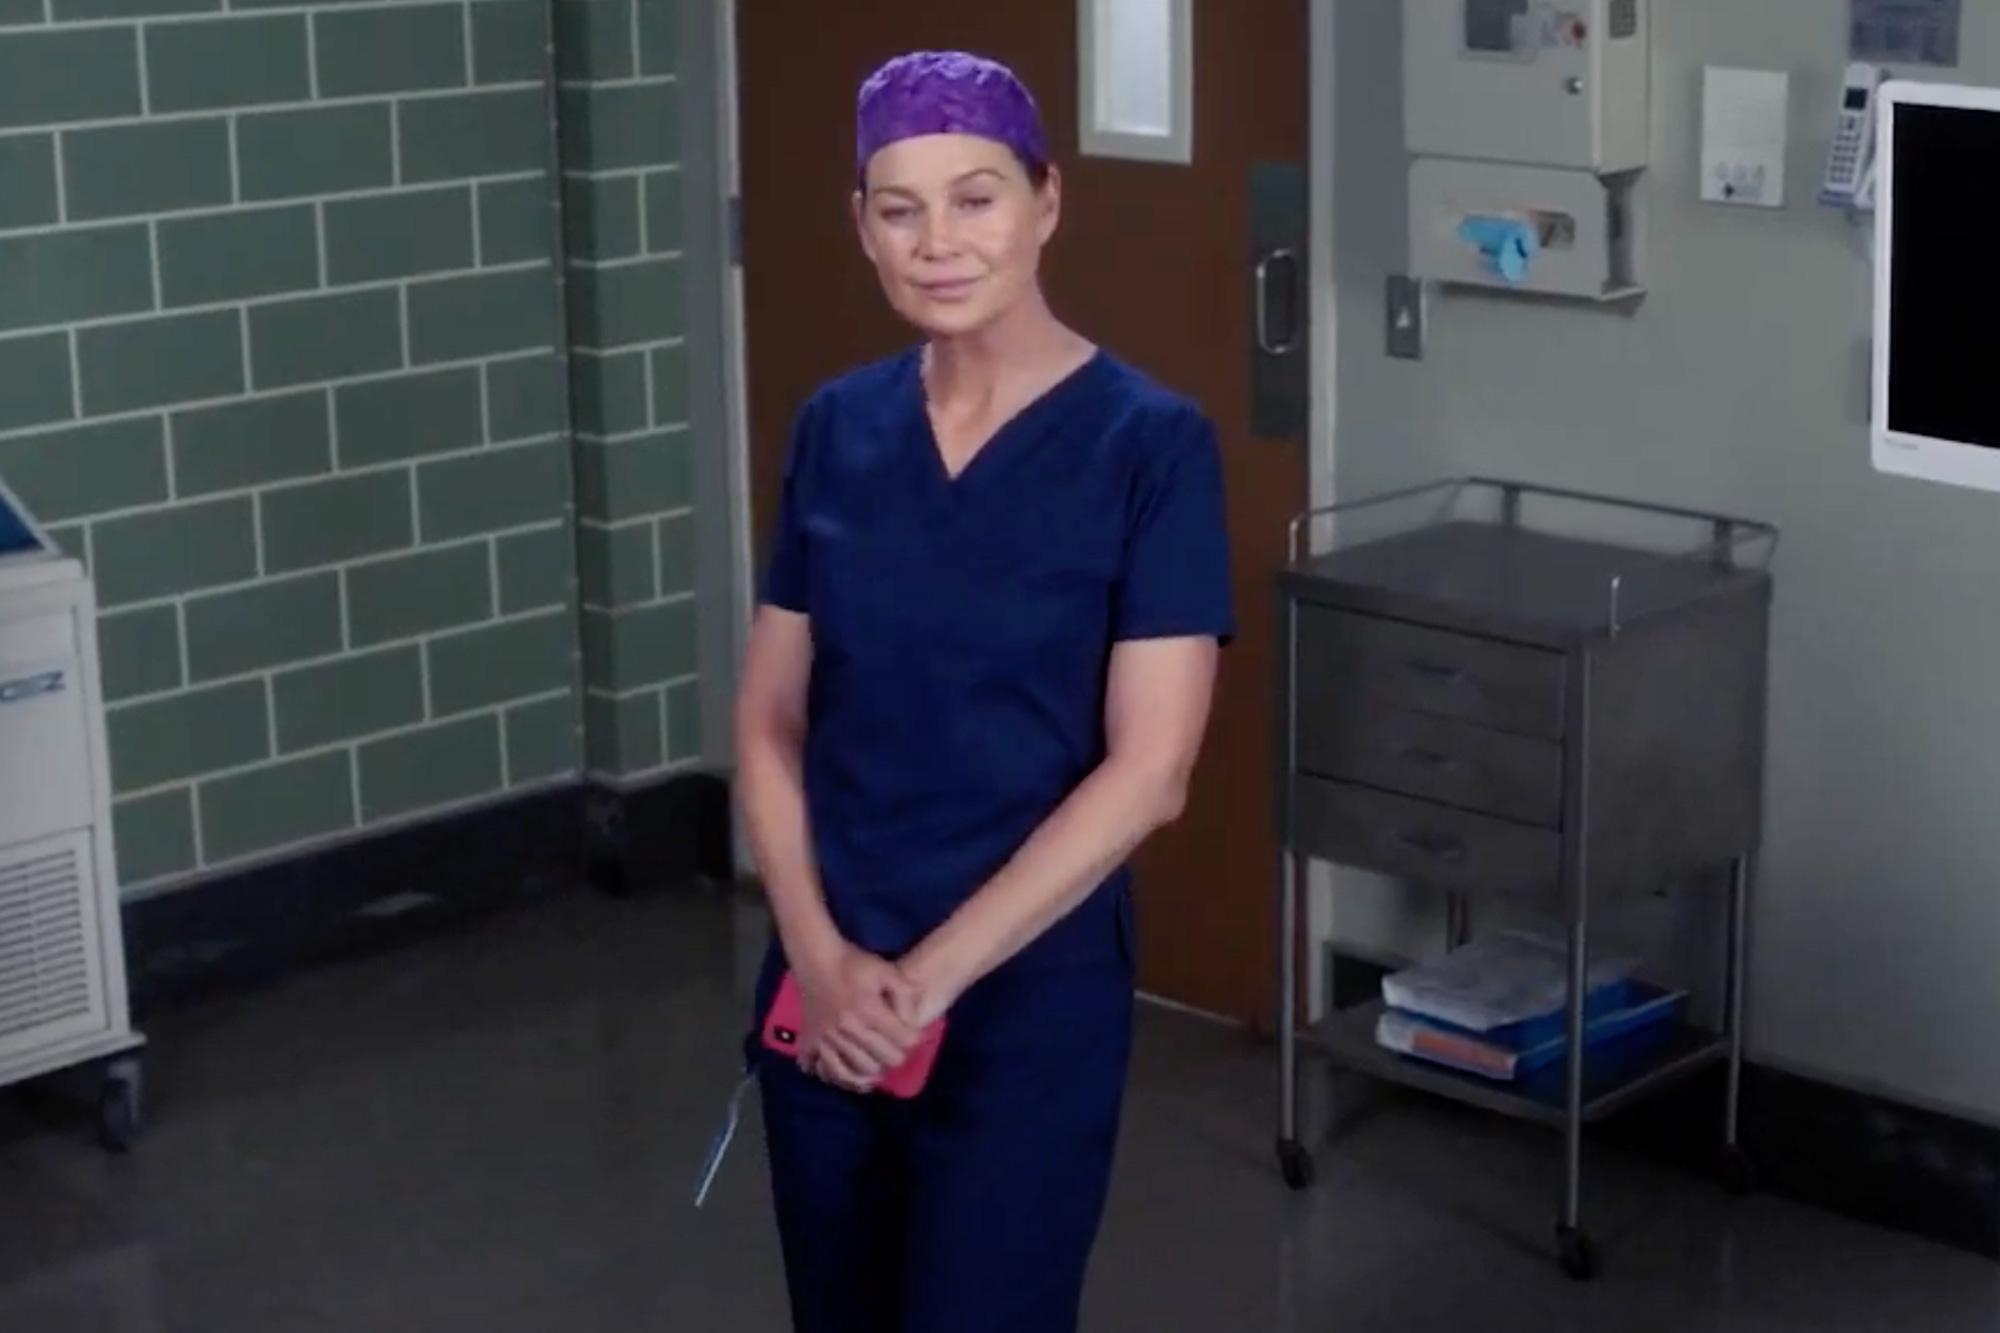 Grey's Anatomy/Station 19 crossover